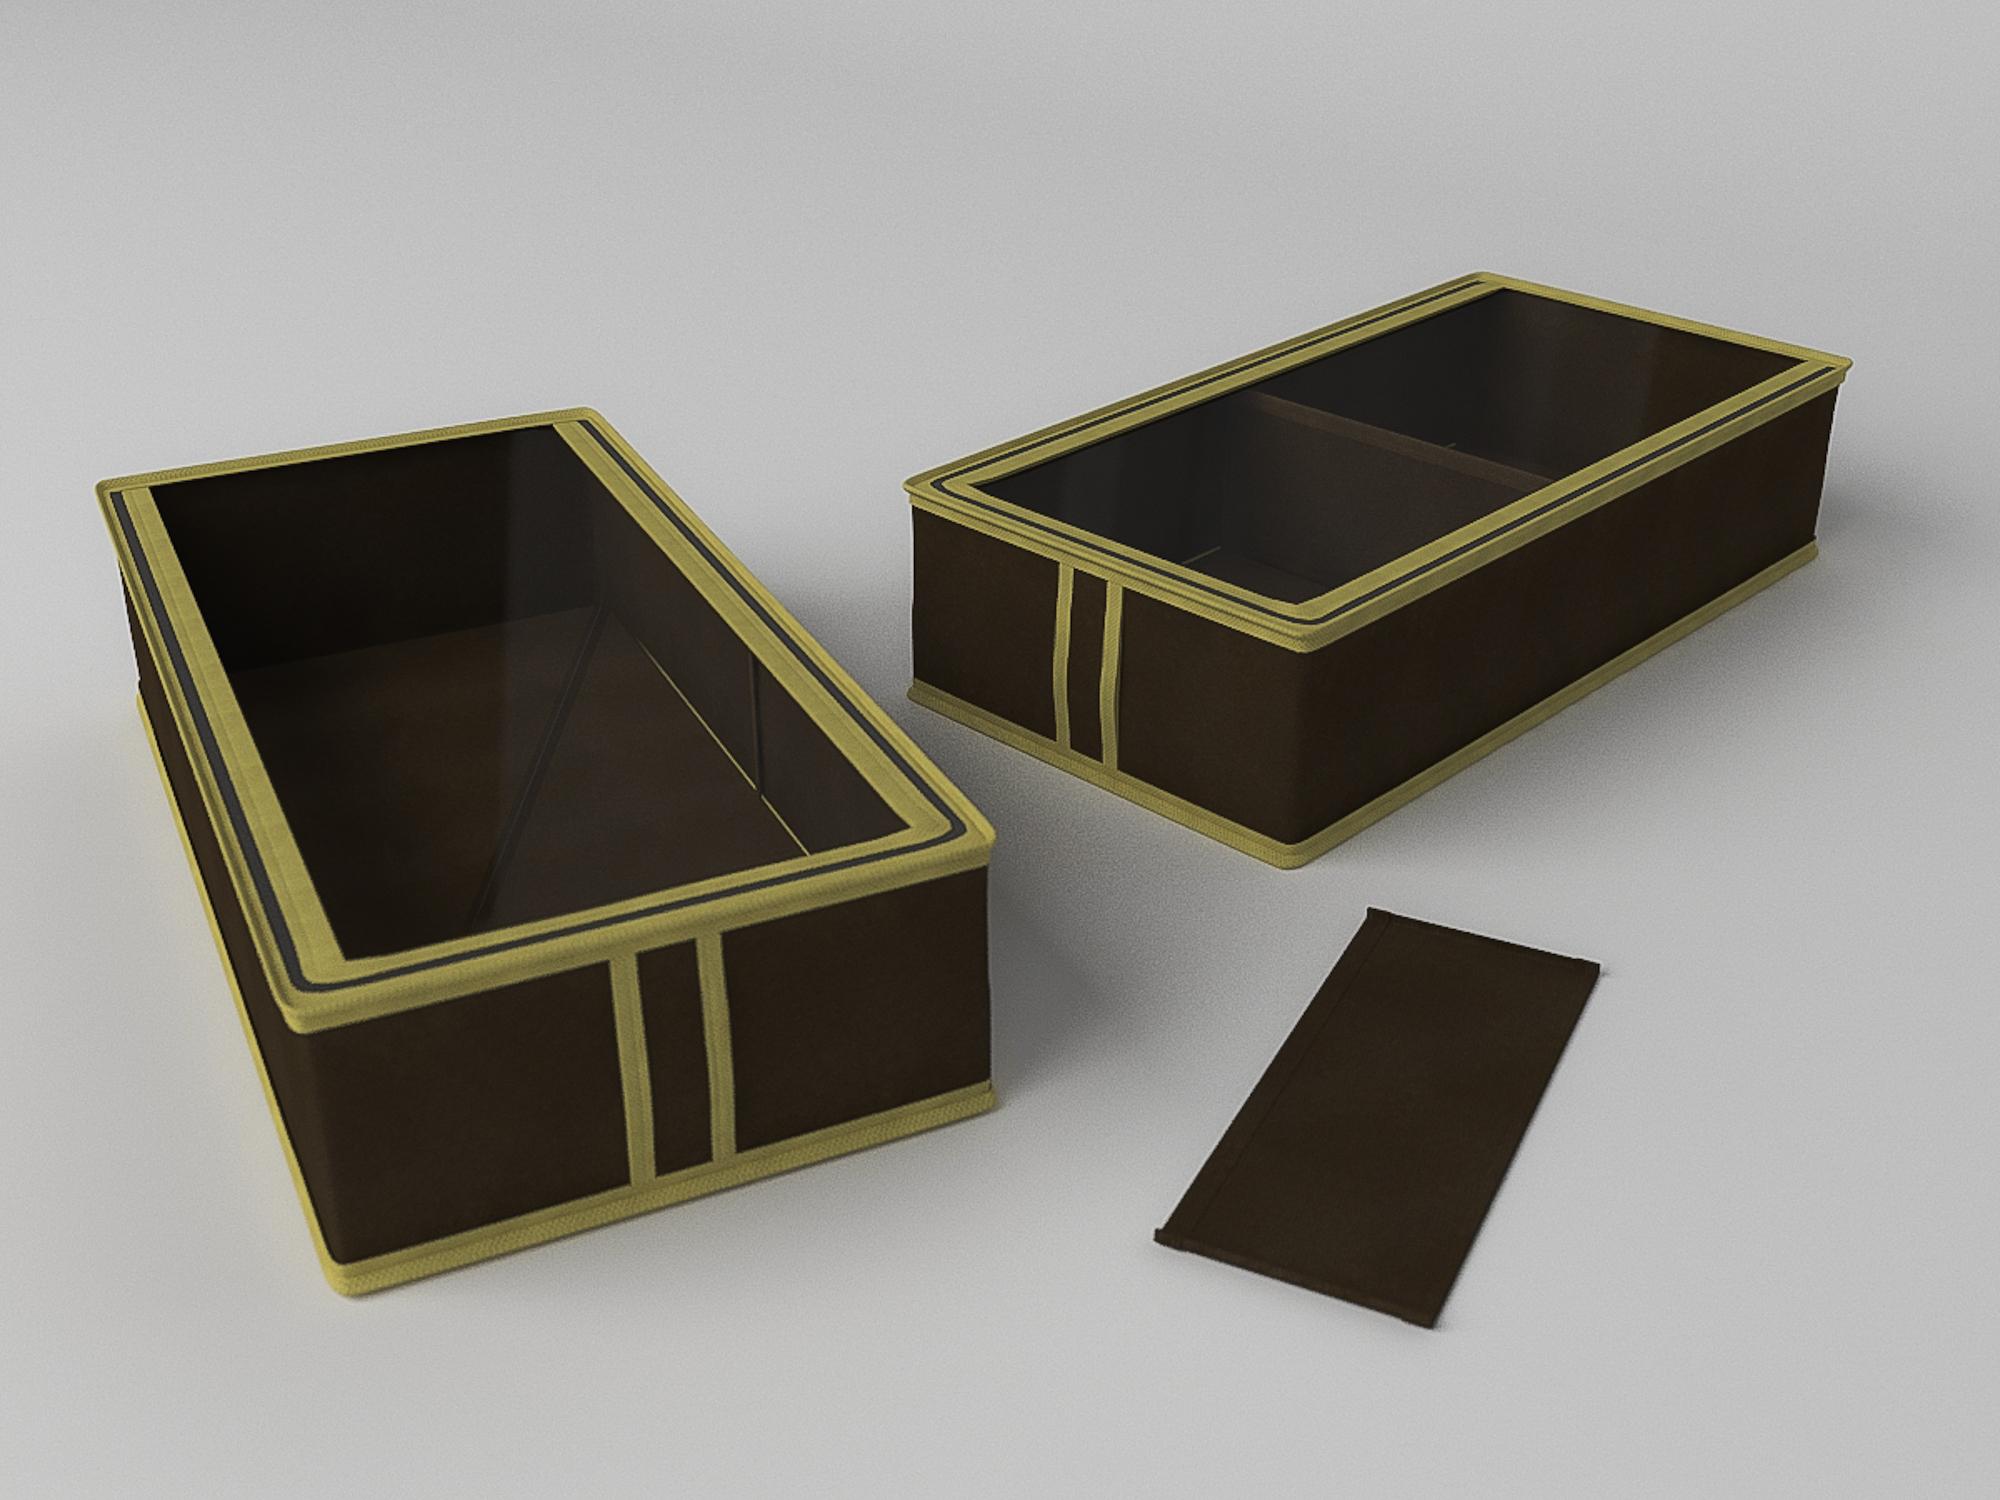 Кофр для обуви Классик Цвет: Коричневый (12х26х52 см) CoFreT cfr288608